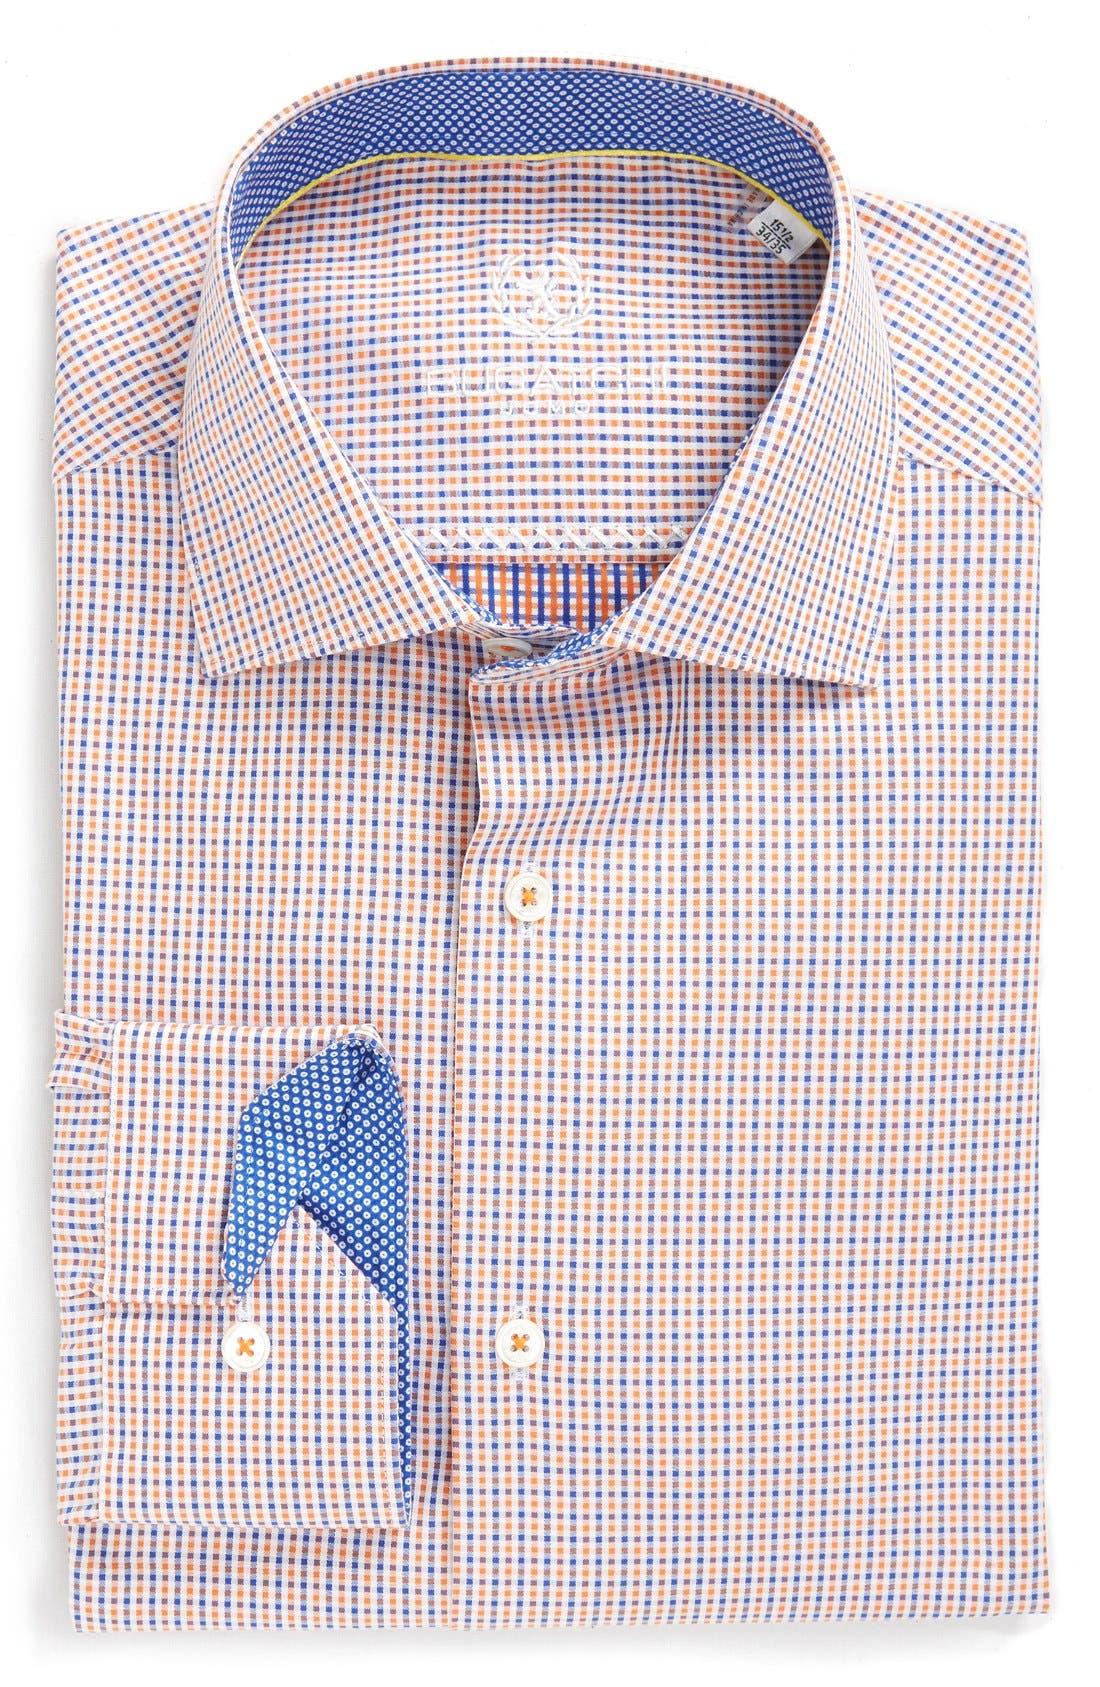 Bugatchi Trim Fit Microcheck Dress Shirt